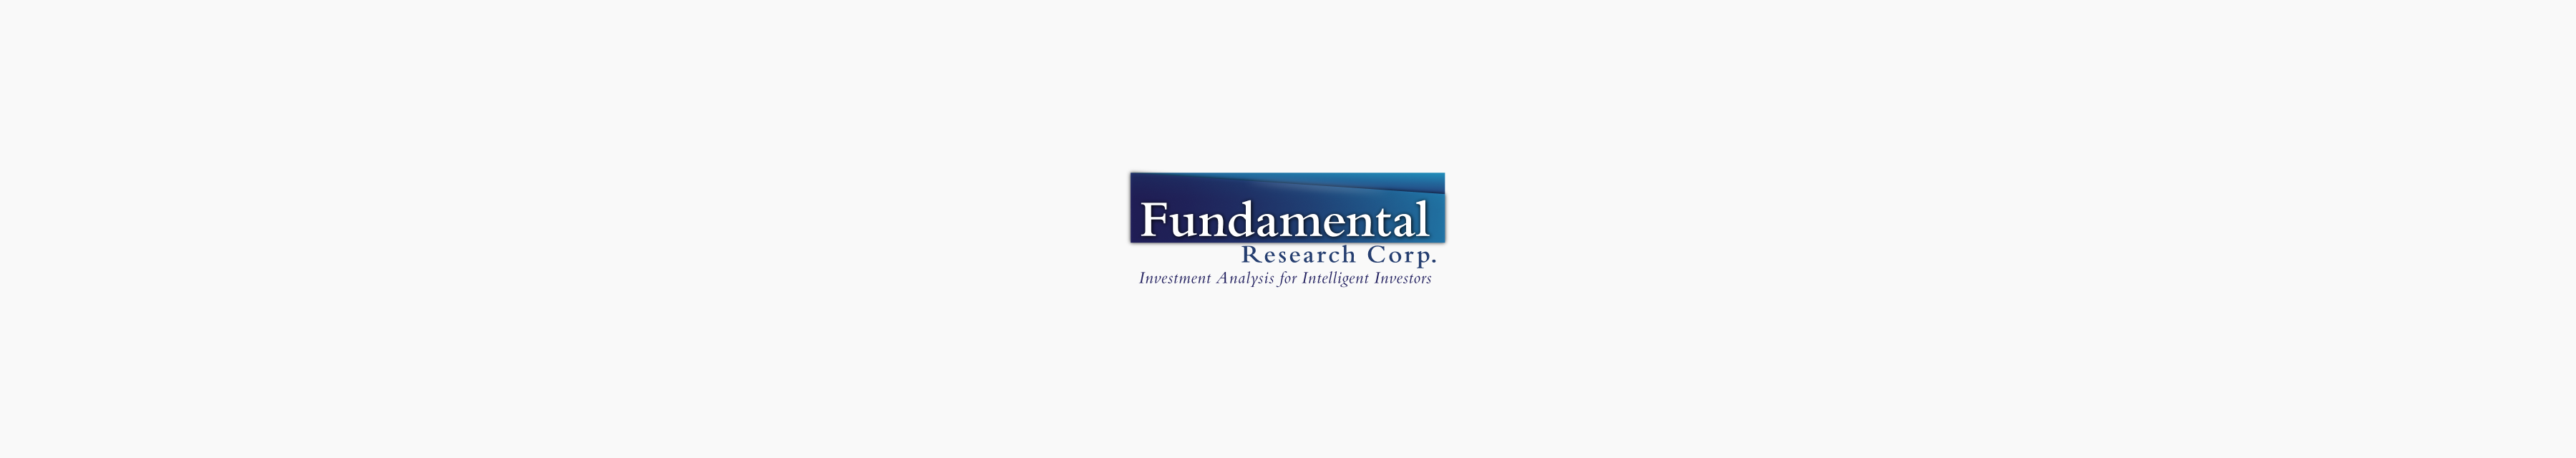 Fundamental Research Corp